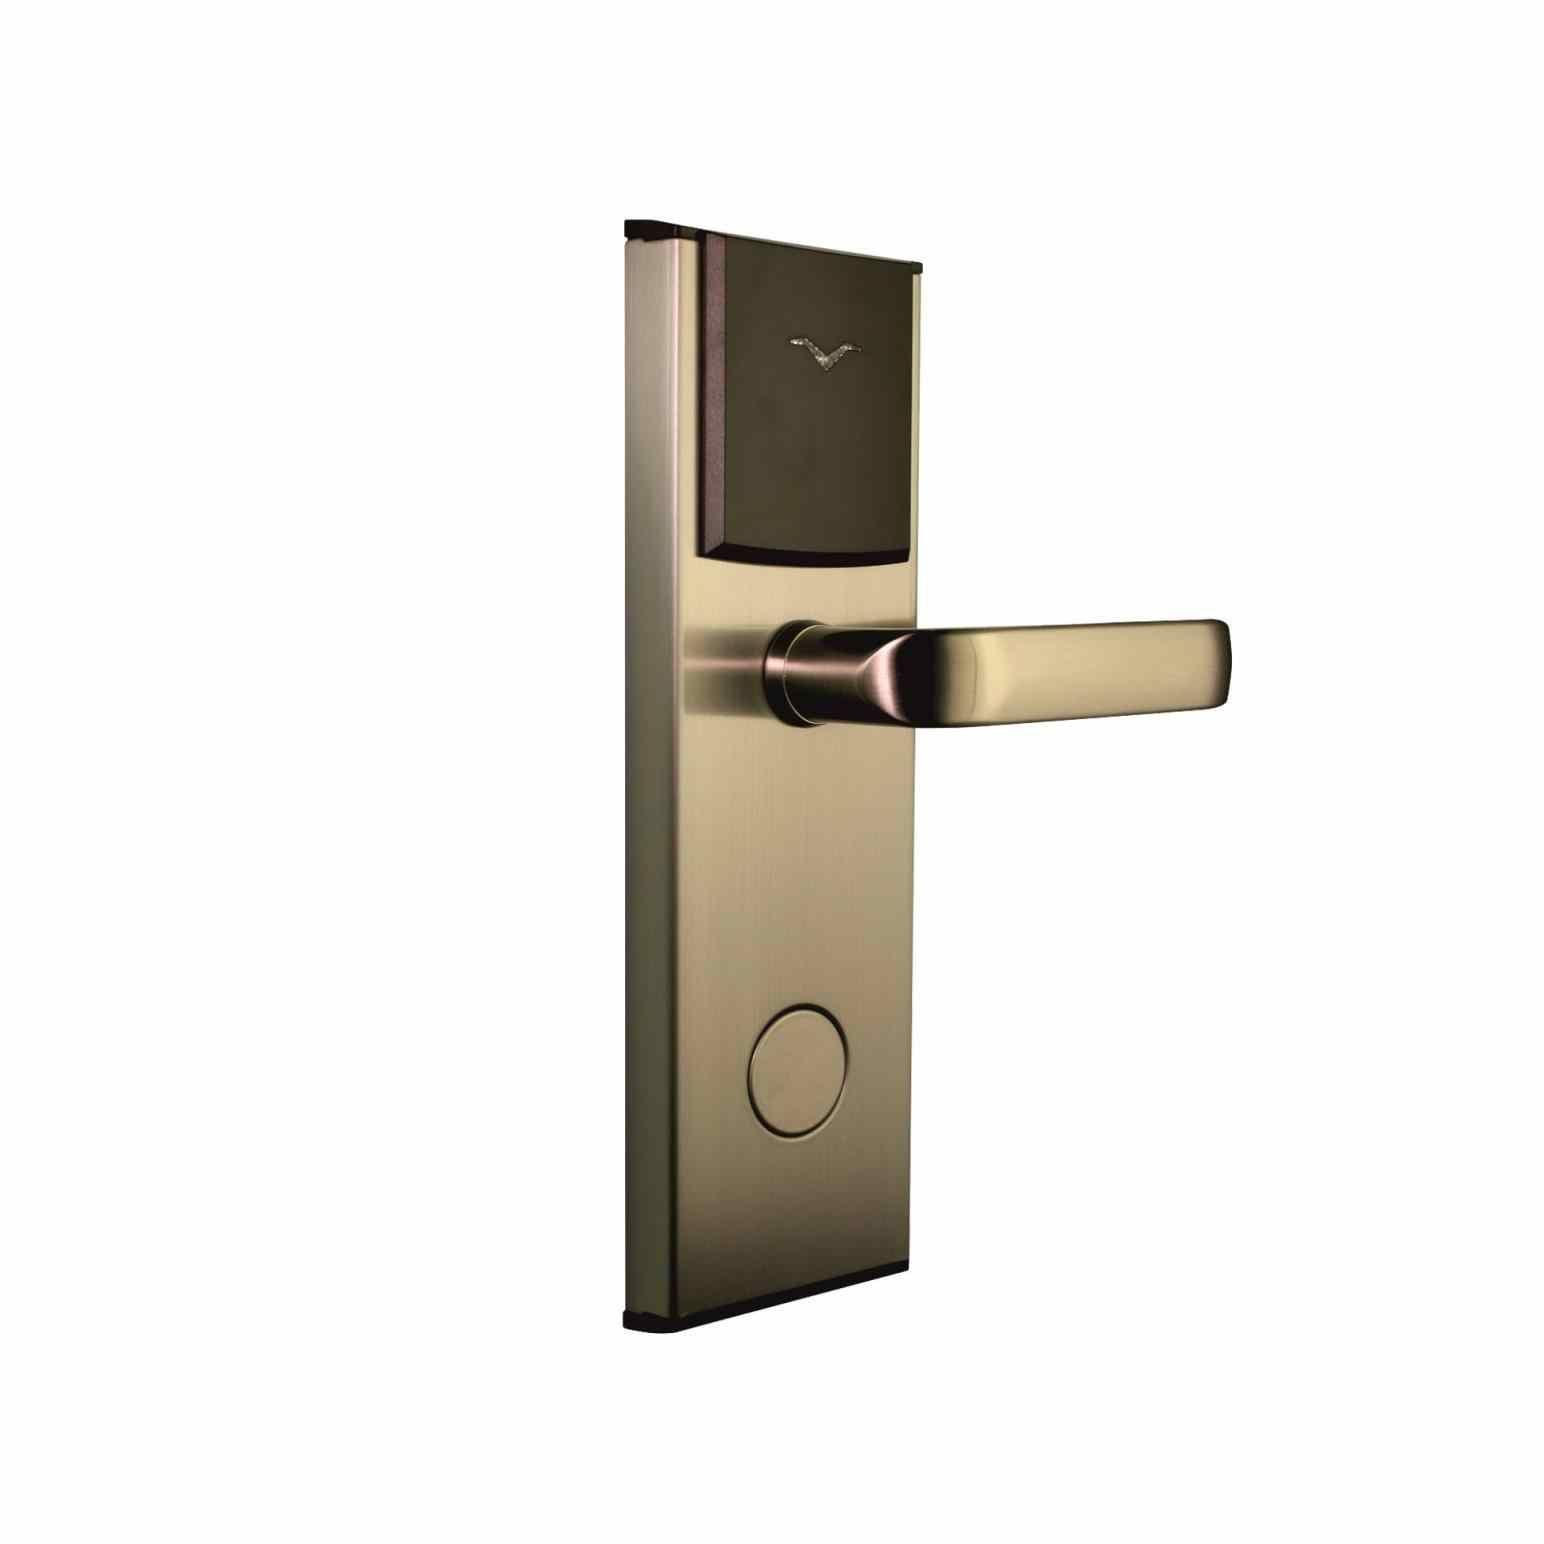 At Disneyus Allstar Music Resort Youtube Hotek Design Your Own Hotel Lock Hotek Hotel Rfid Door Locks Design Your Own Hotel Lock Hotel Lock Doors Door Locks